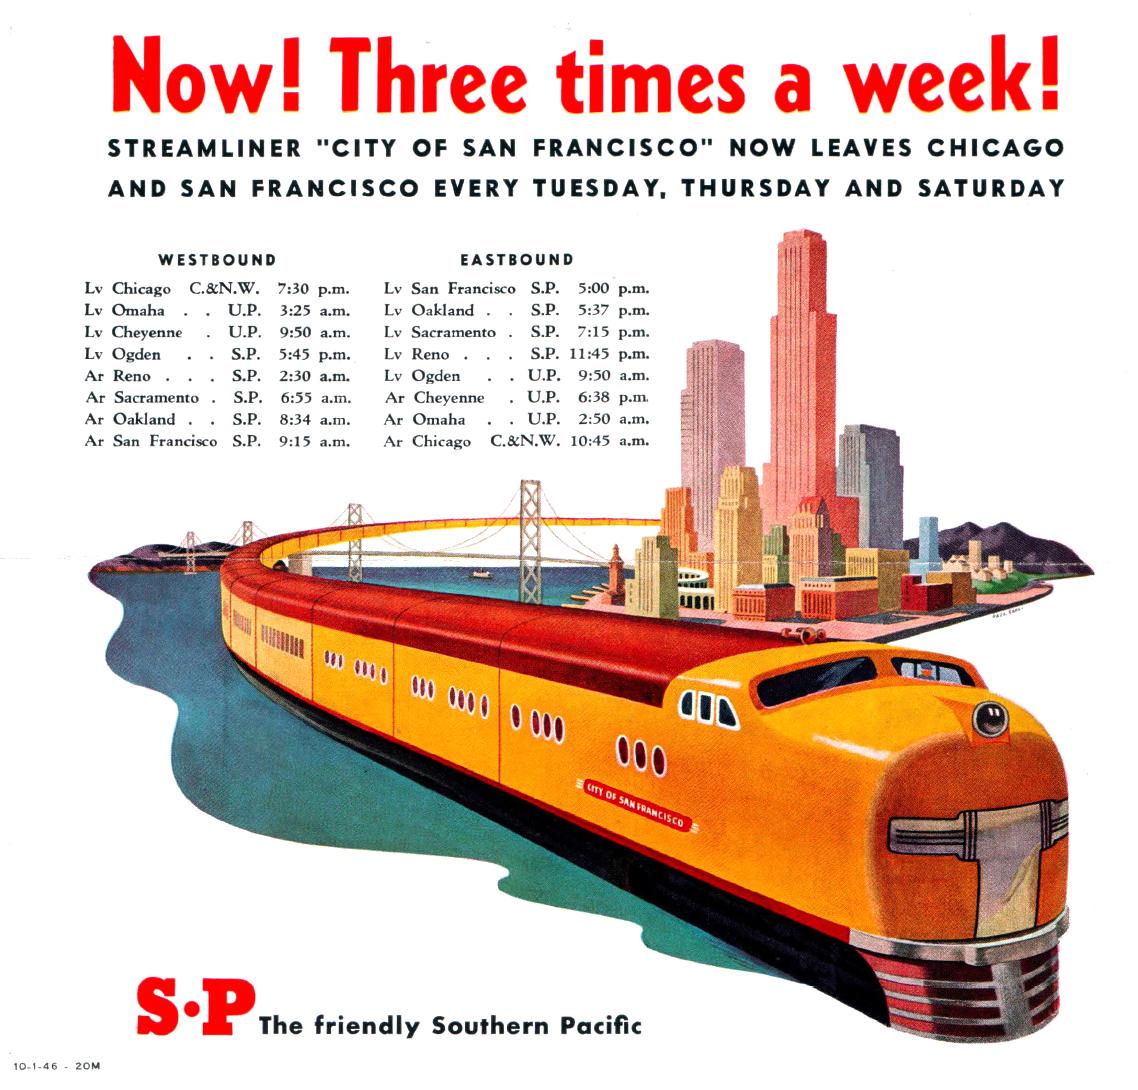 https://upload.wikimedia.org/wikipedia/commons/e/ec/City_of_San_Francisco_SP_mailer_October_1%2C_1946.jpg